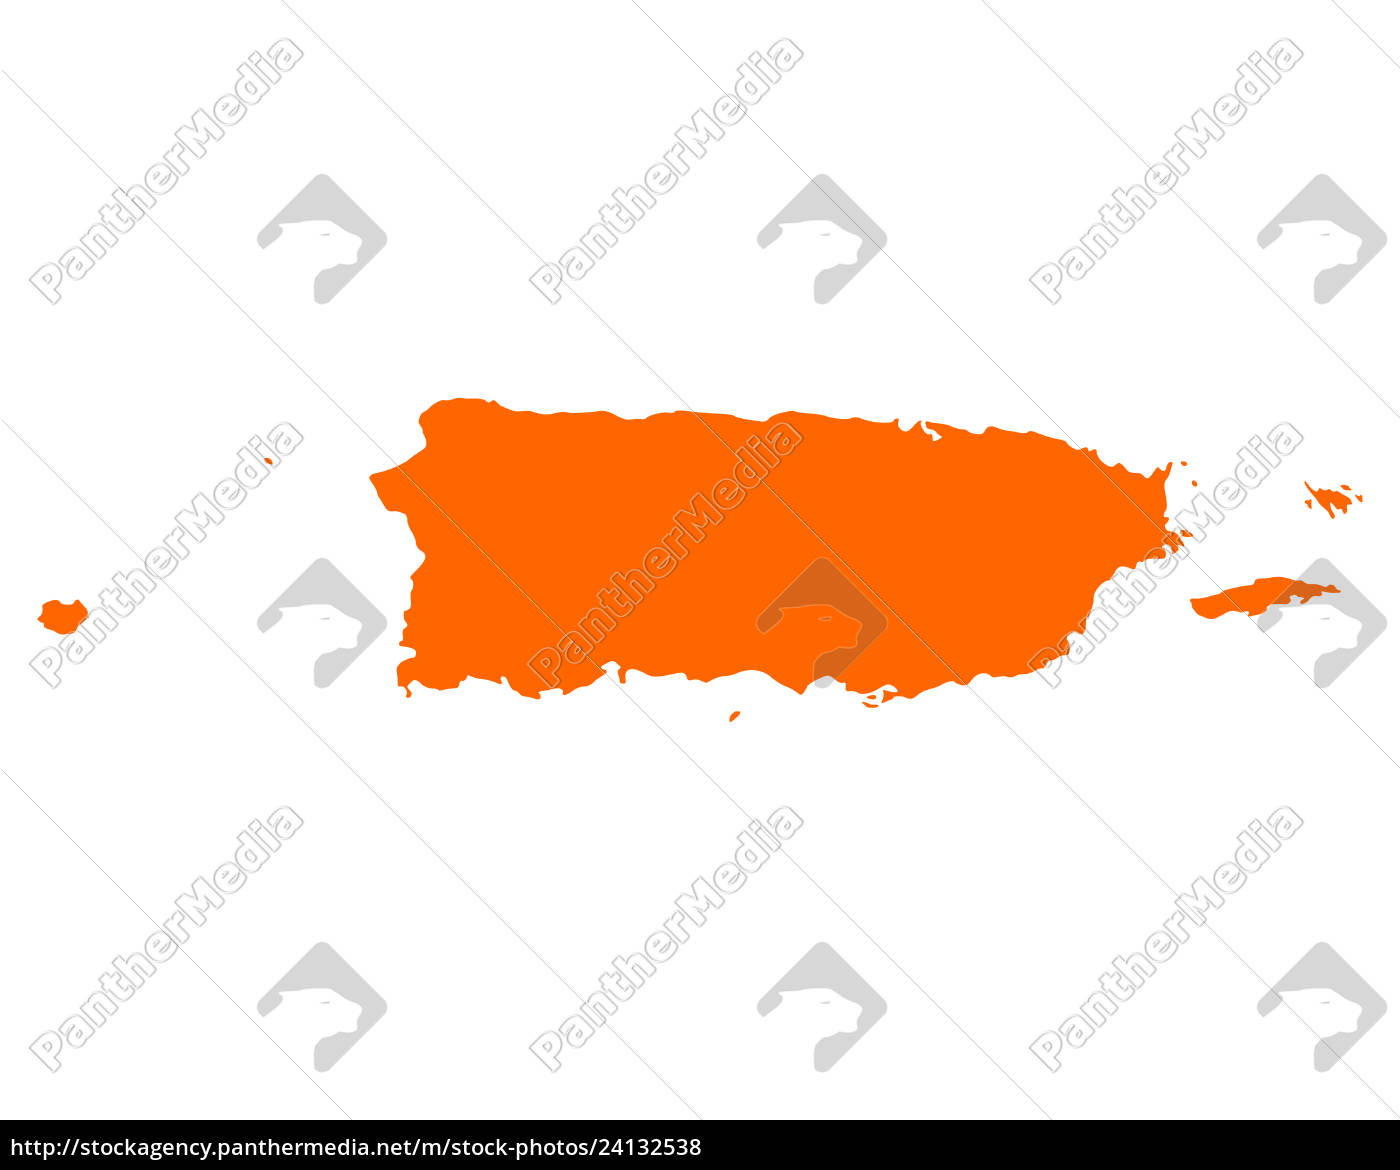 Kort Over Puerto Rico Stockphoto 24132538 Panthermedia